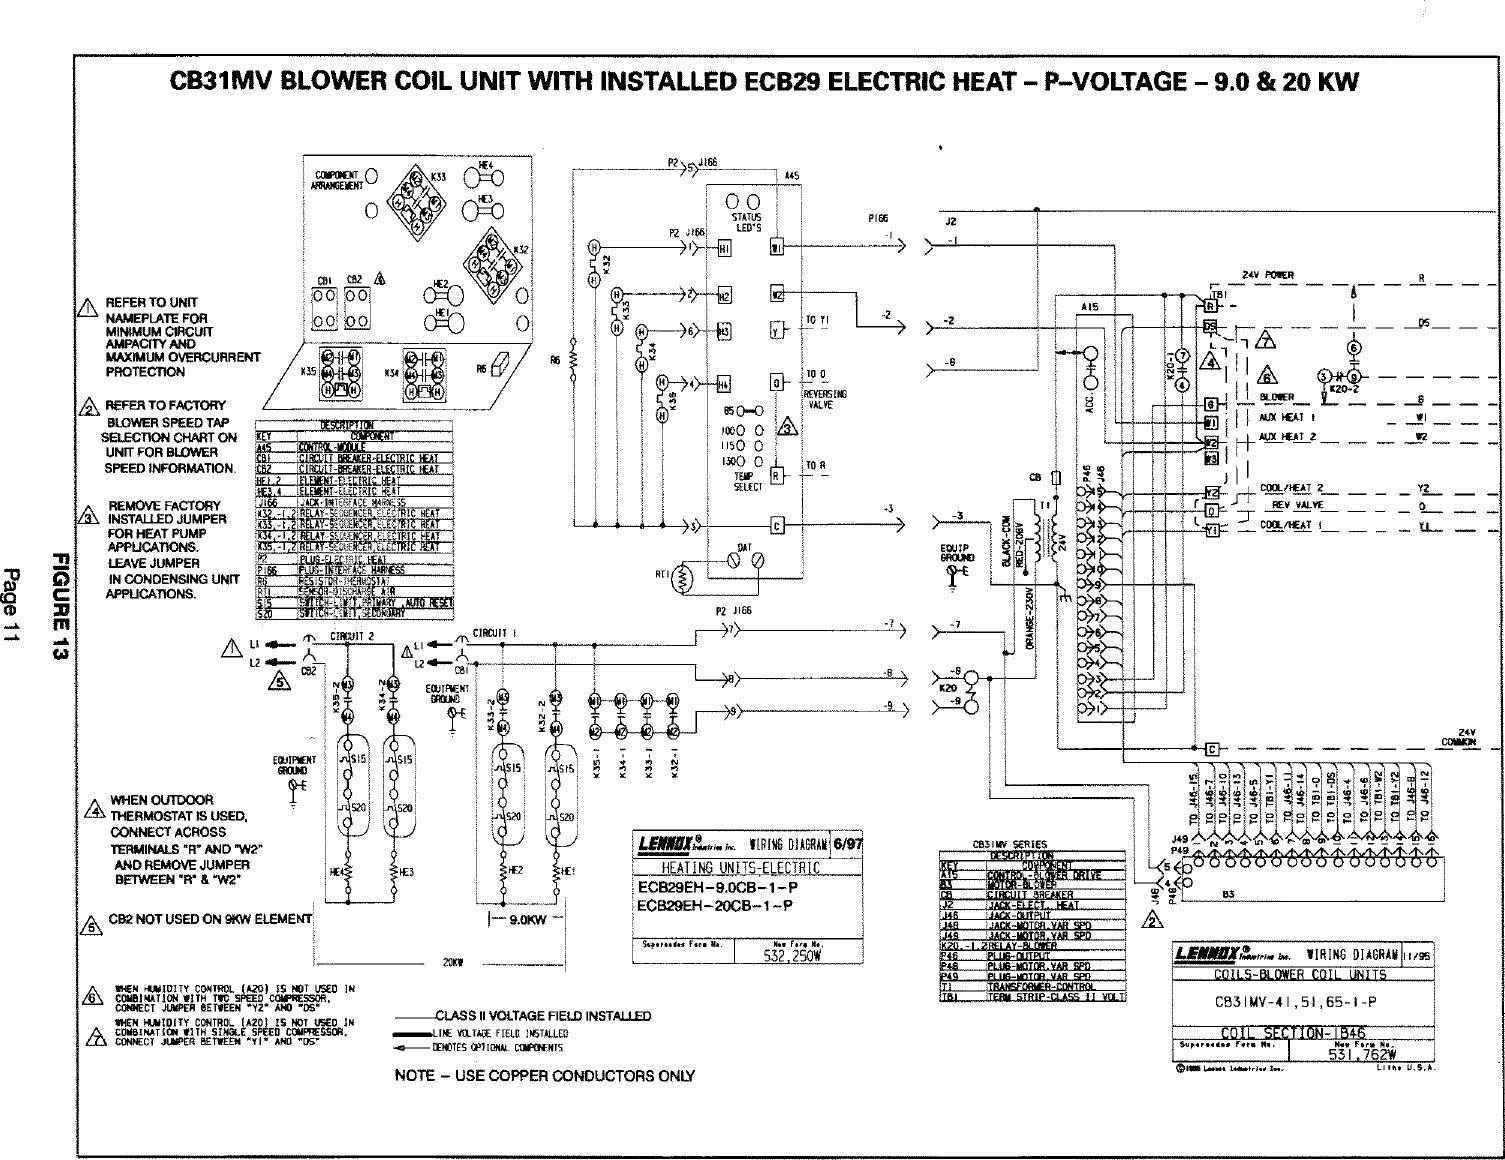 lennox air handler auxiliary heater kit manual l0805584 rh usermanual wiki Old Furnace Wiring Diagram Old Lennox Furnace Wiring Diagram